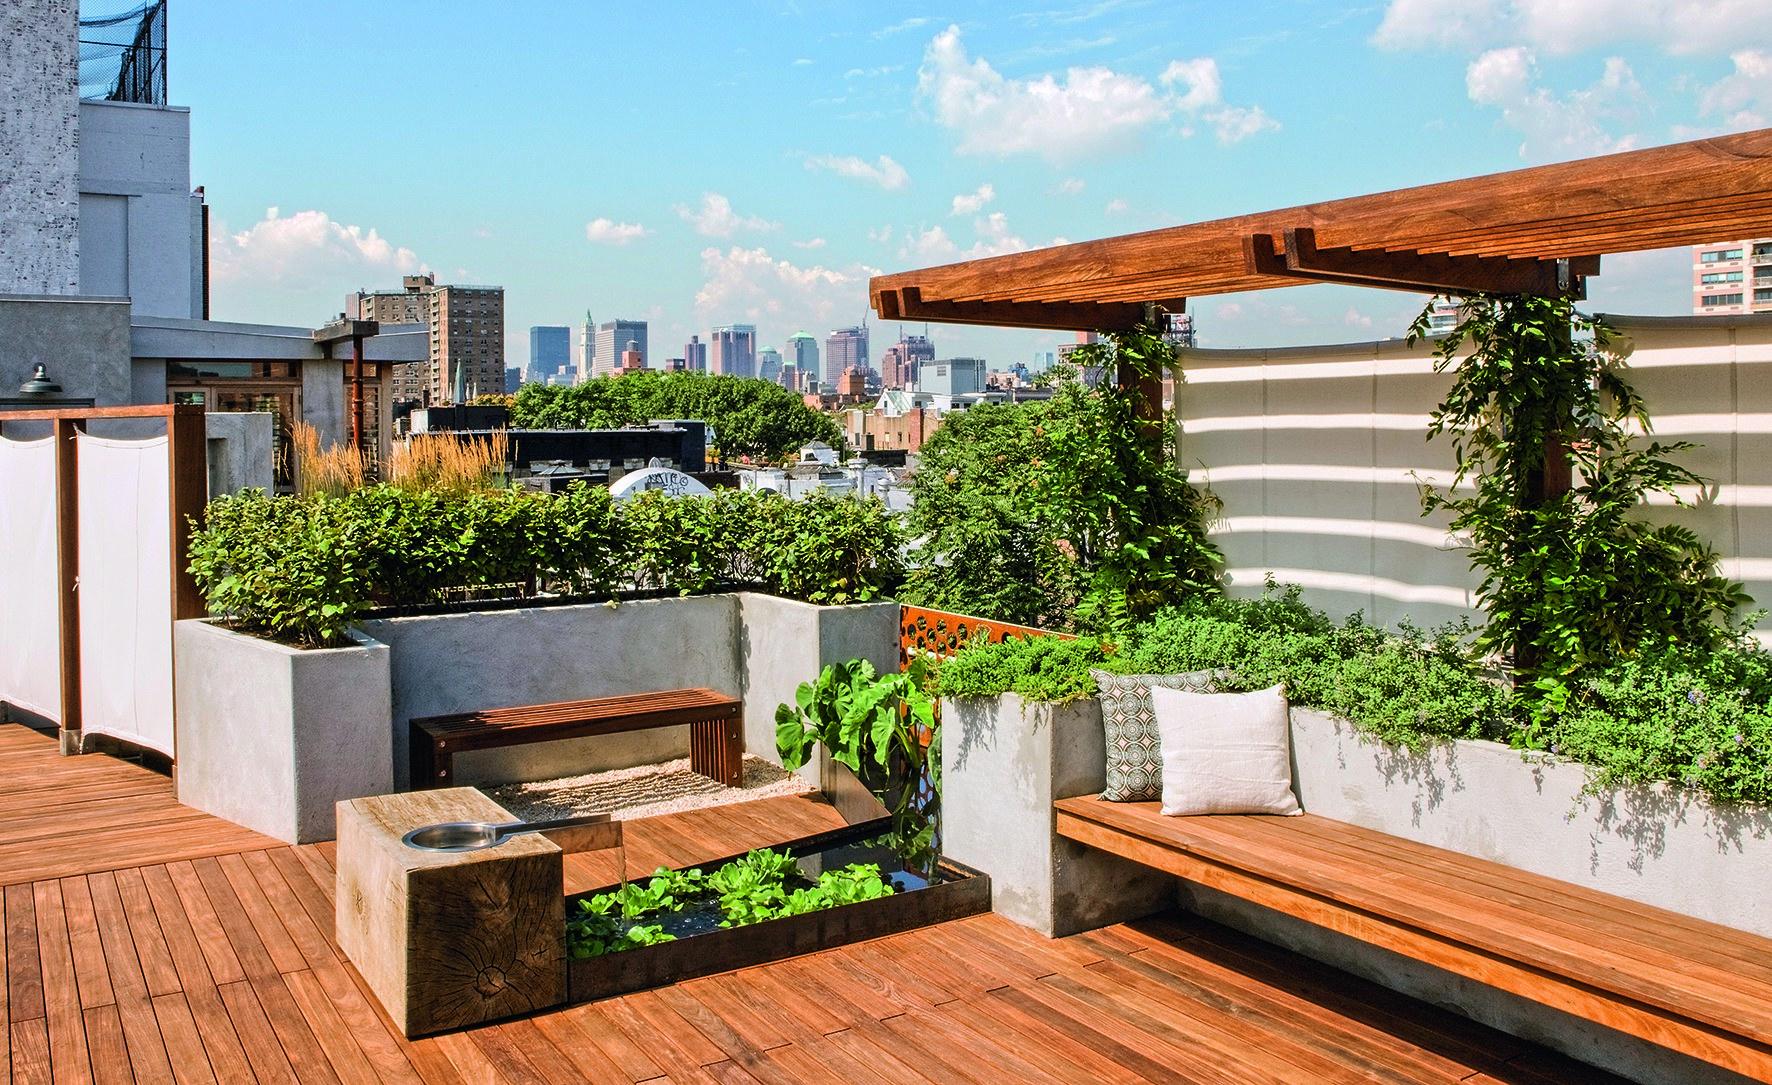 roof garden design 9 remarkable rooftop garden designs around the world photos   architectural LDRPJQT